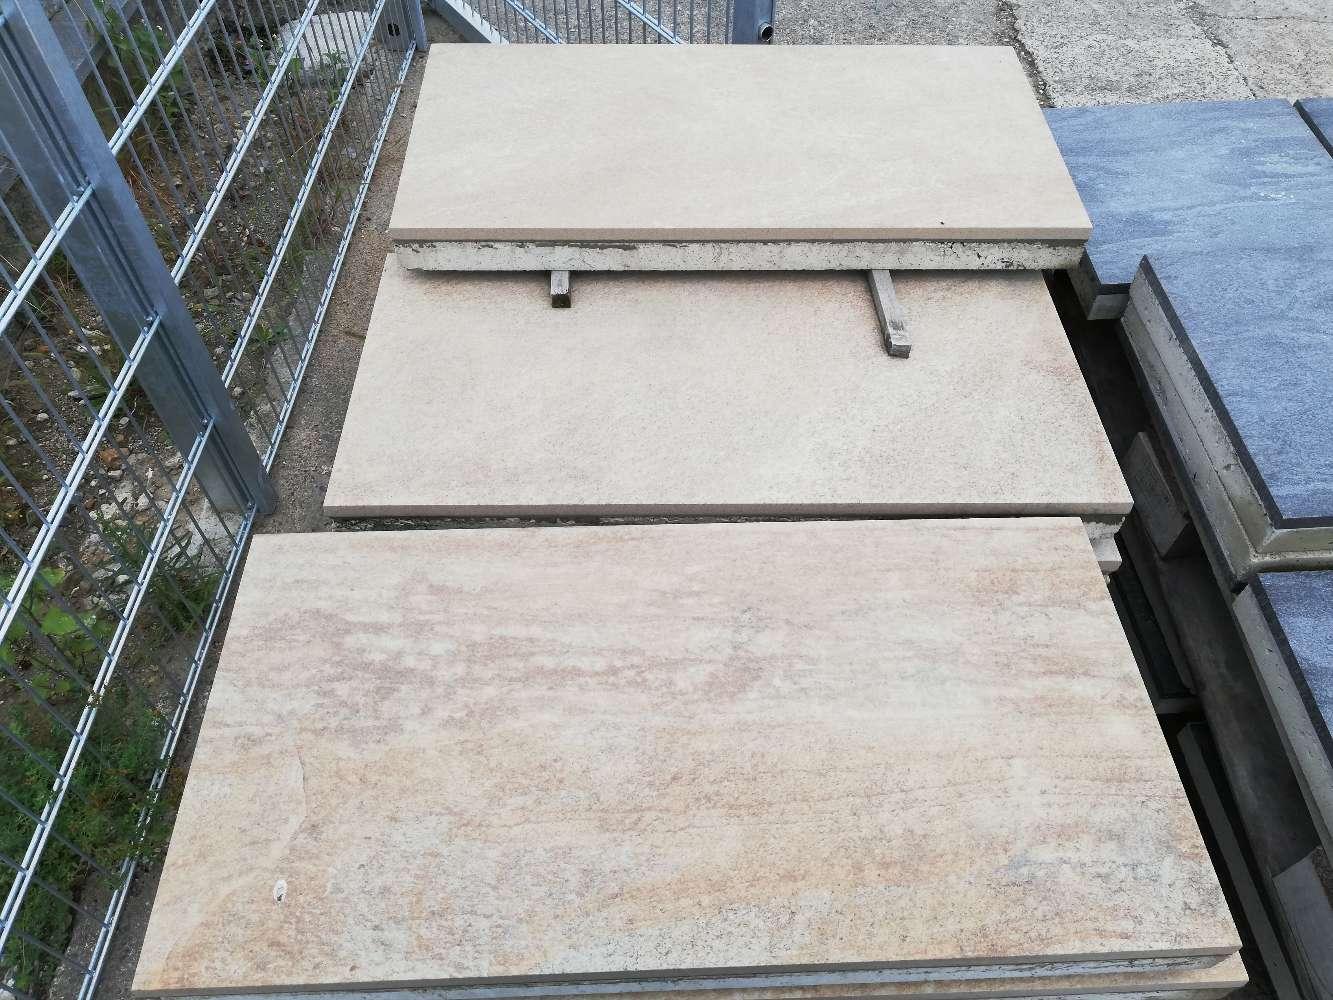 Keramik Terrassenplatte gelb-ocker 40/80/2+2cm mit Betonkern